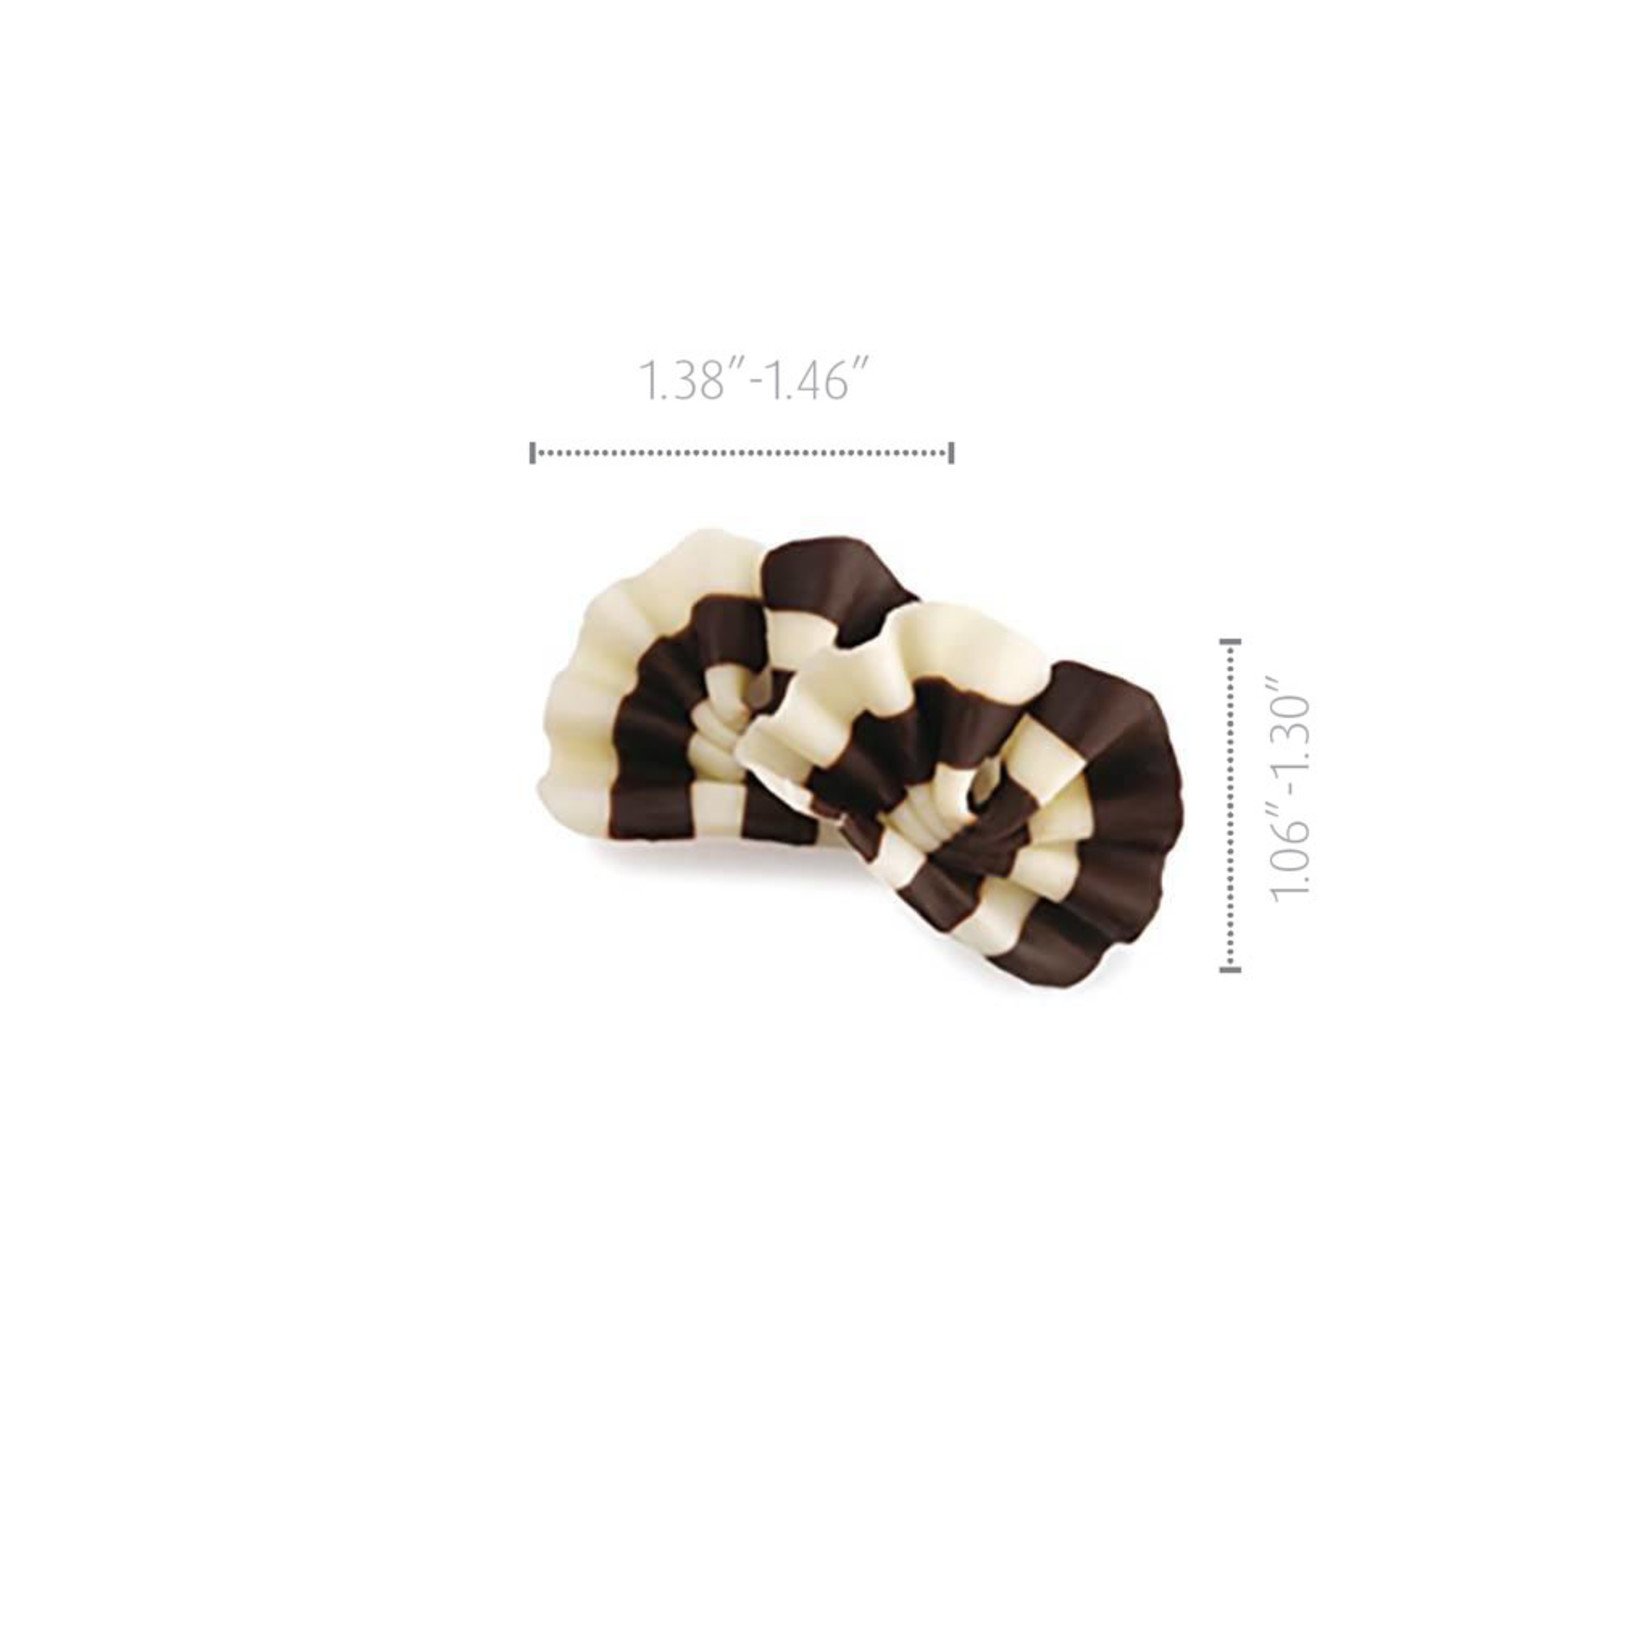 Dobla Dobla - Dark/White Chocolate Forest Shavings - 1.3'' (11.9oz), 73191-R